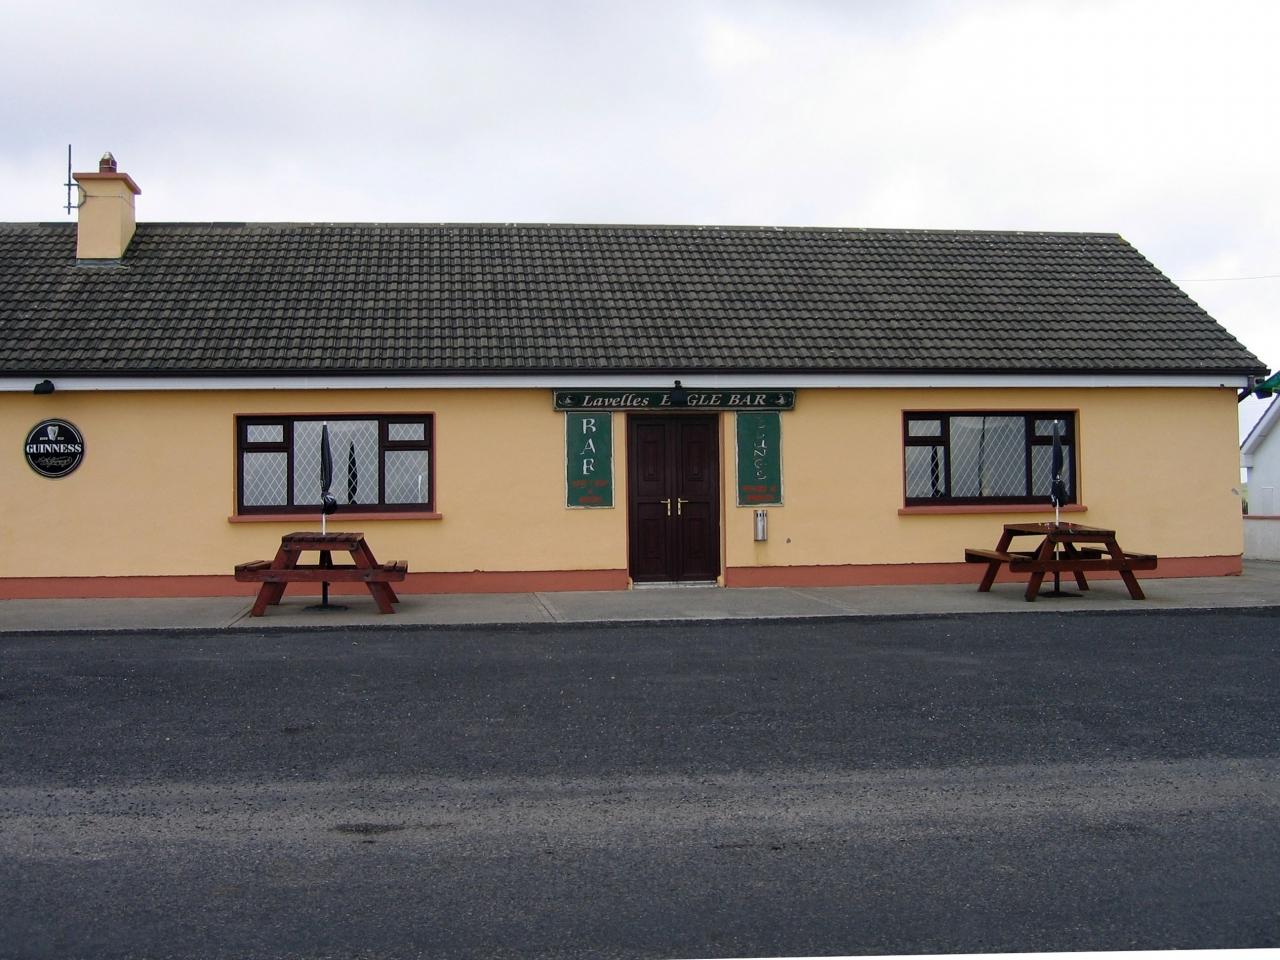 Lavelles Pub in Corclogh